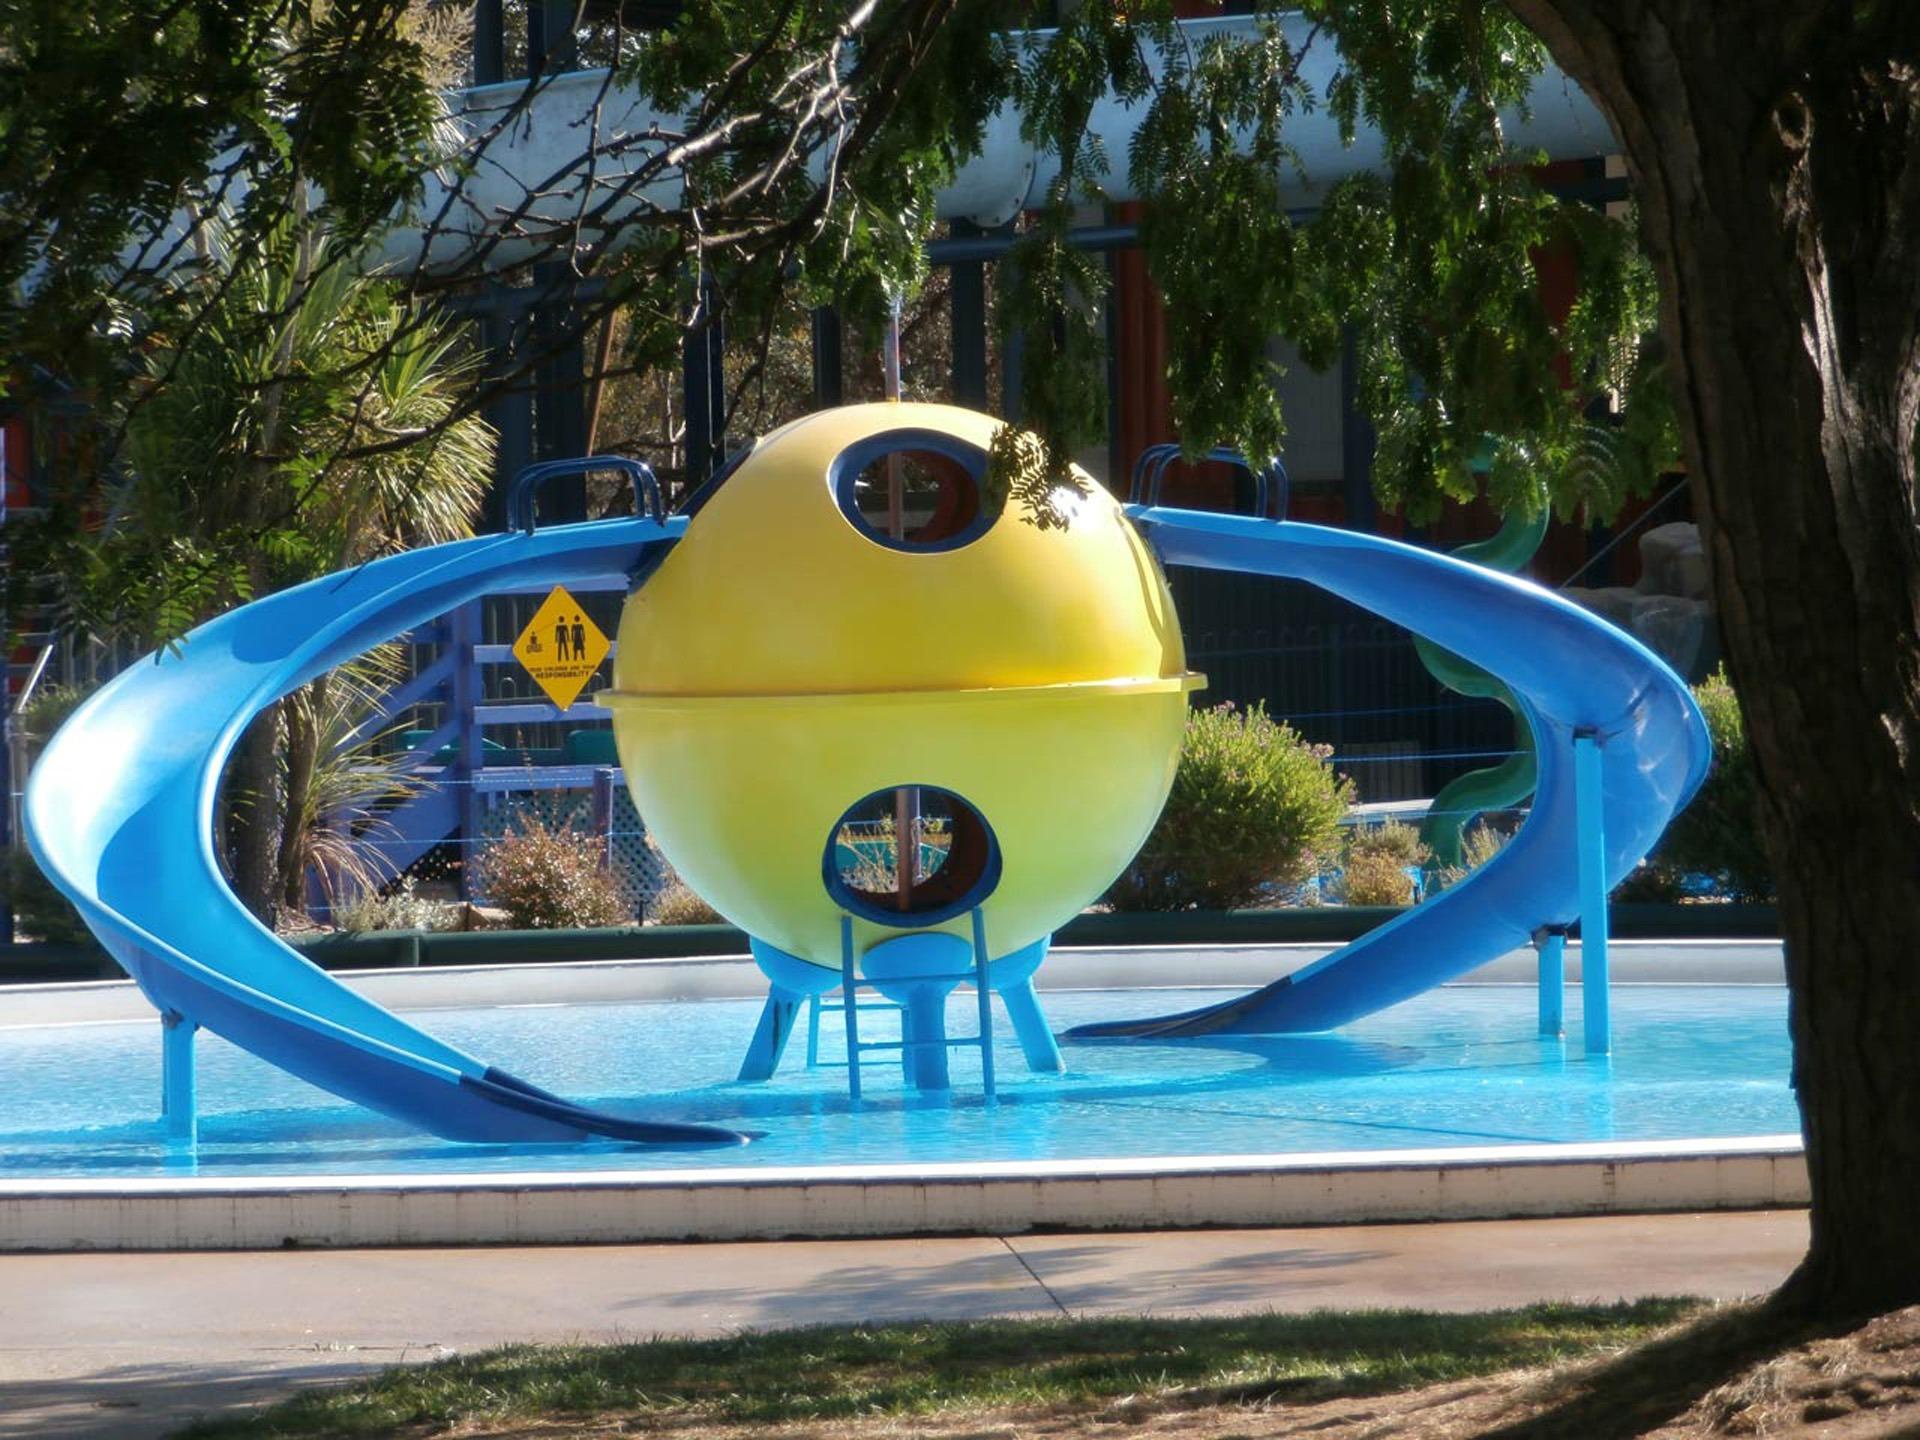 Wet Recreation Swim Amusement Park Splash Swimming Pool Leisure Fun Aqua Resort Waterpark Water